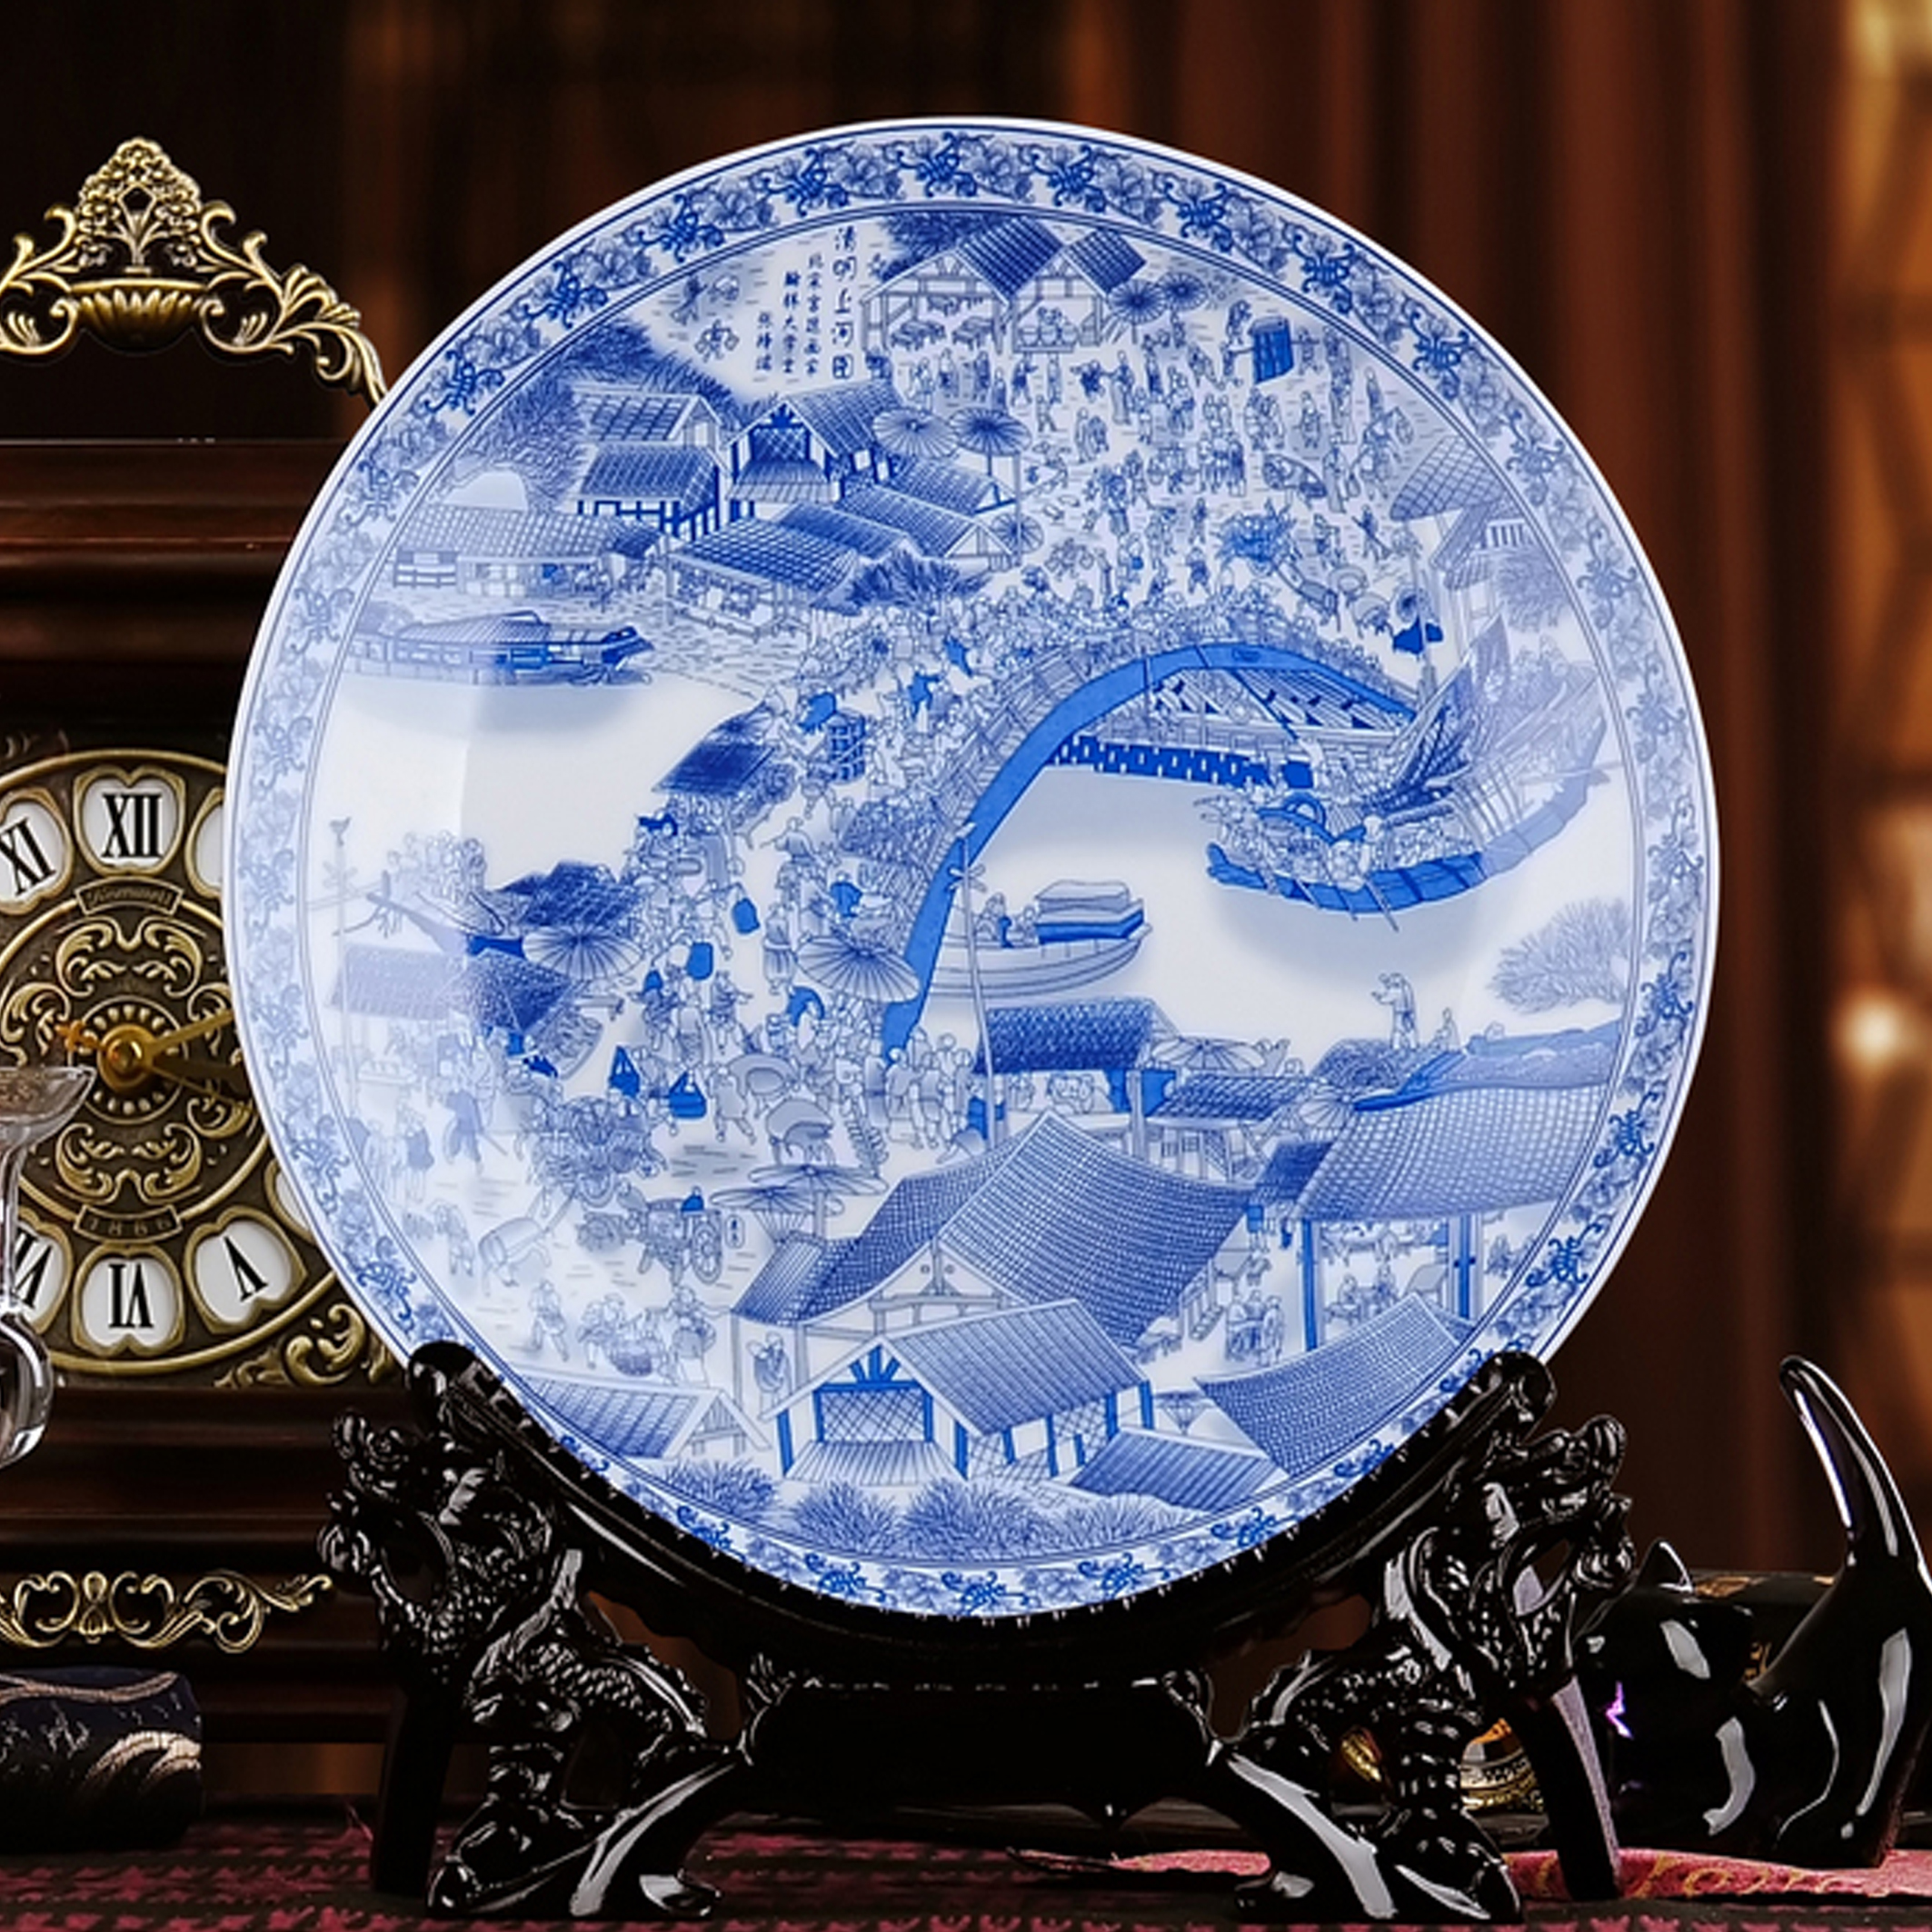 White ceramic plates for crafts - Jingdezhen Ceramics Porcelain Painting Decoration